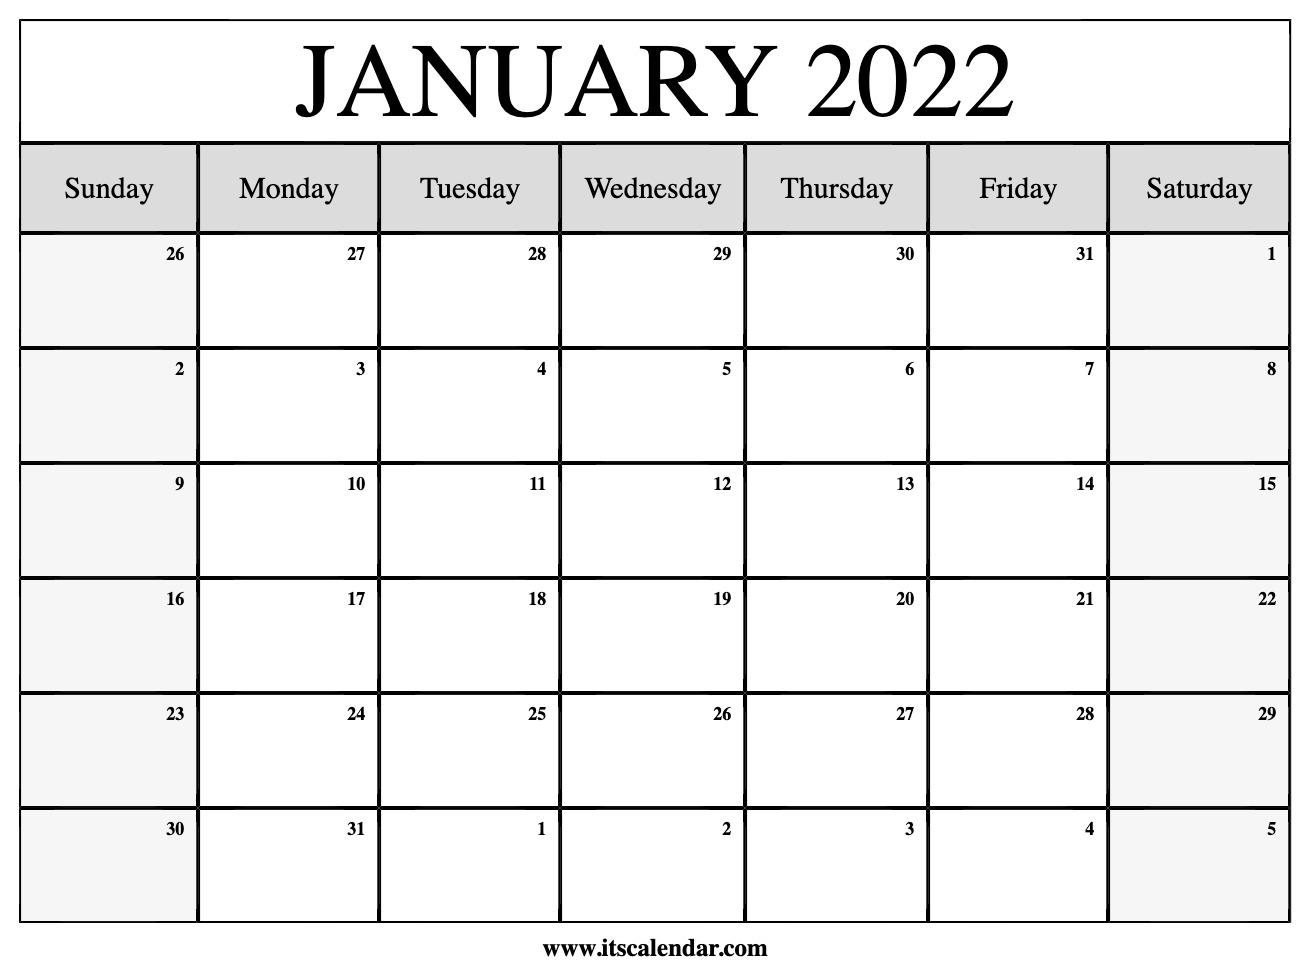 Free Printable January 2022 Calendar Intended For Calendar Of January 2022